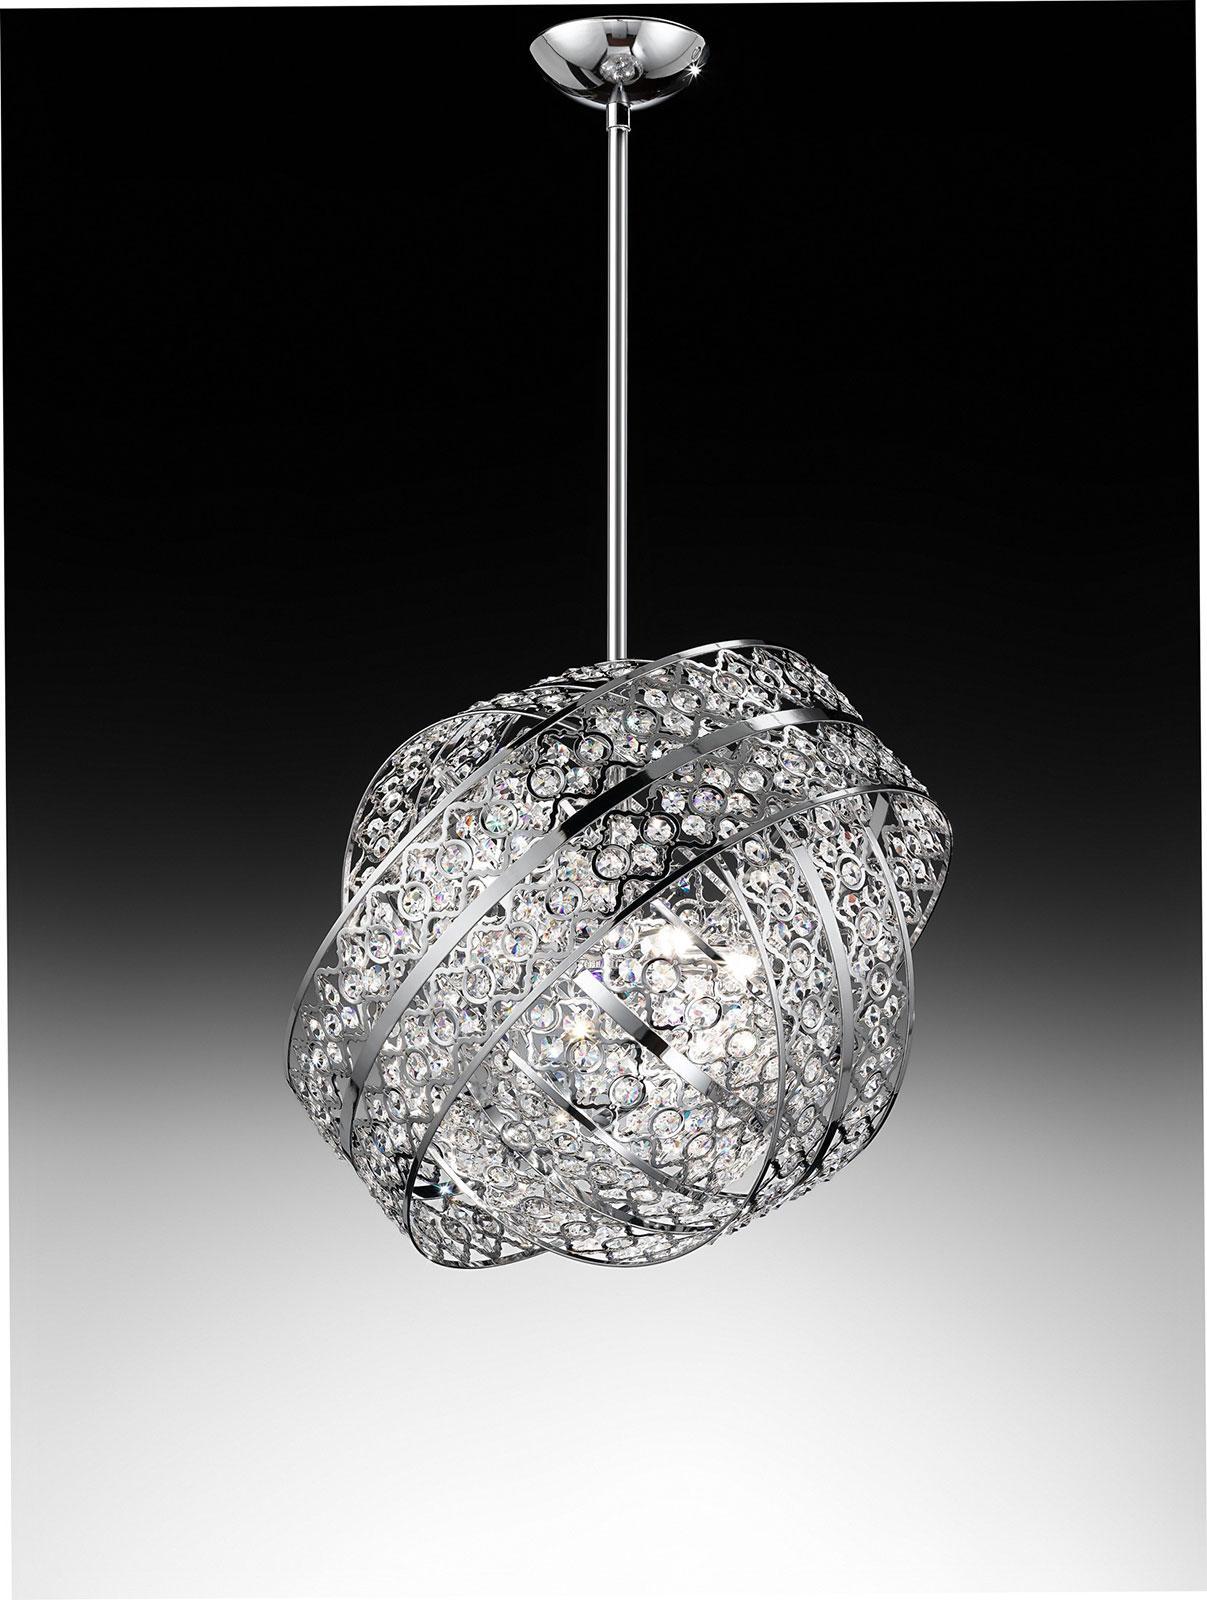 Star metal pendant light idd murano hand blown glass contemporary lamp pendant light pendant lamp online sell metal frame crystal pendants arubaitofo Choice Image